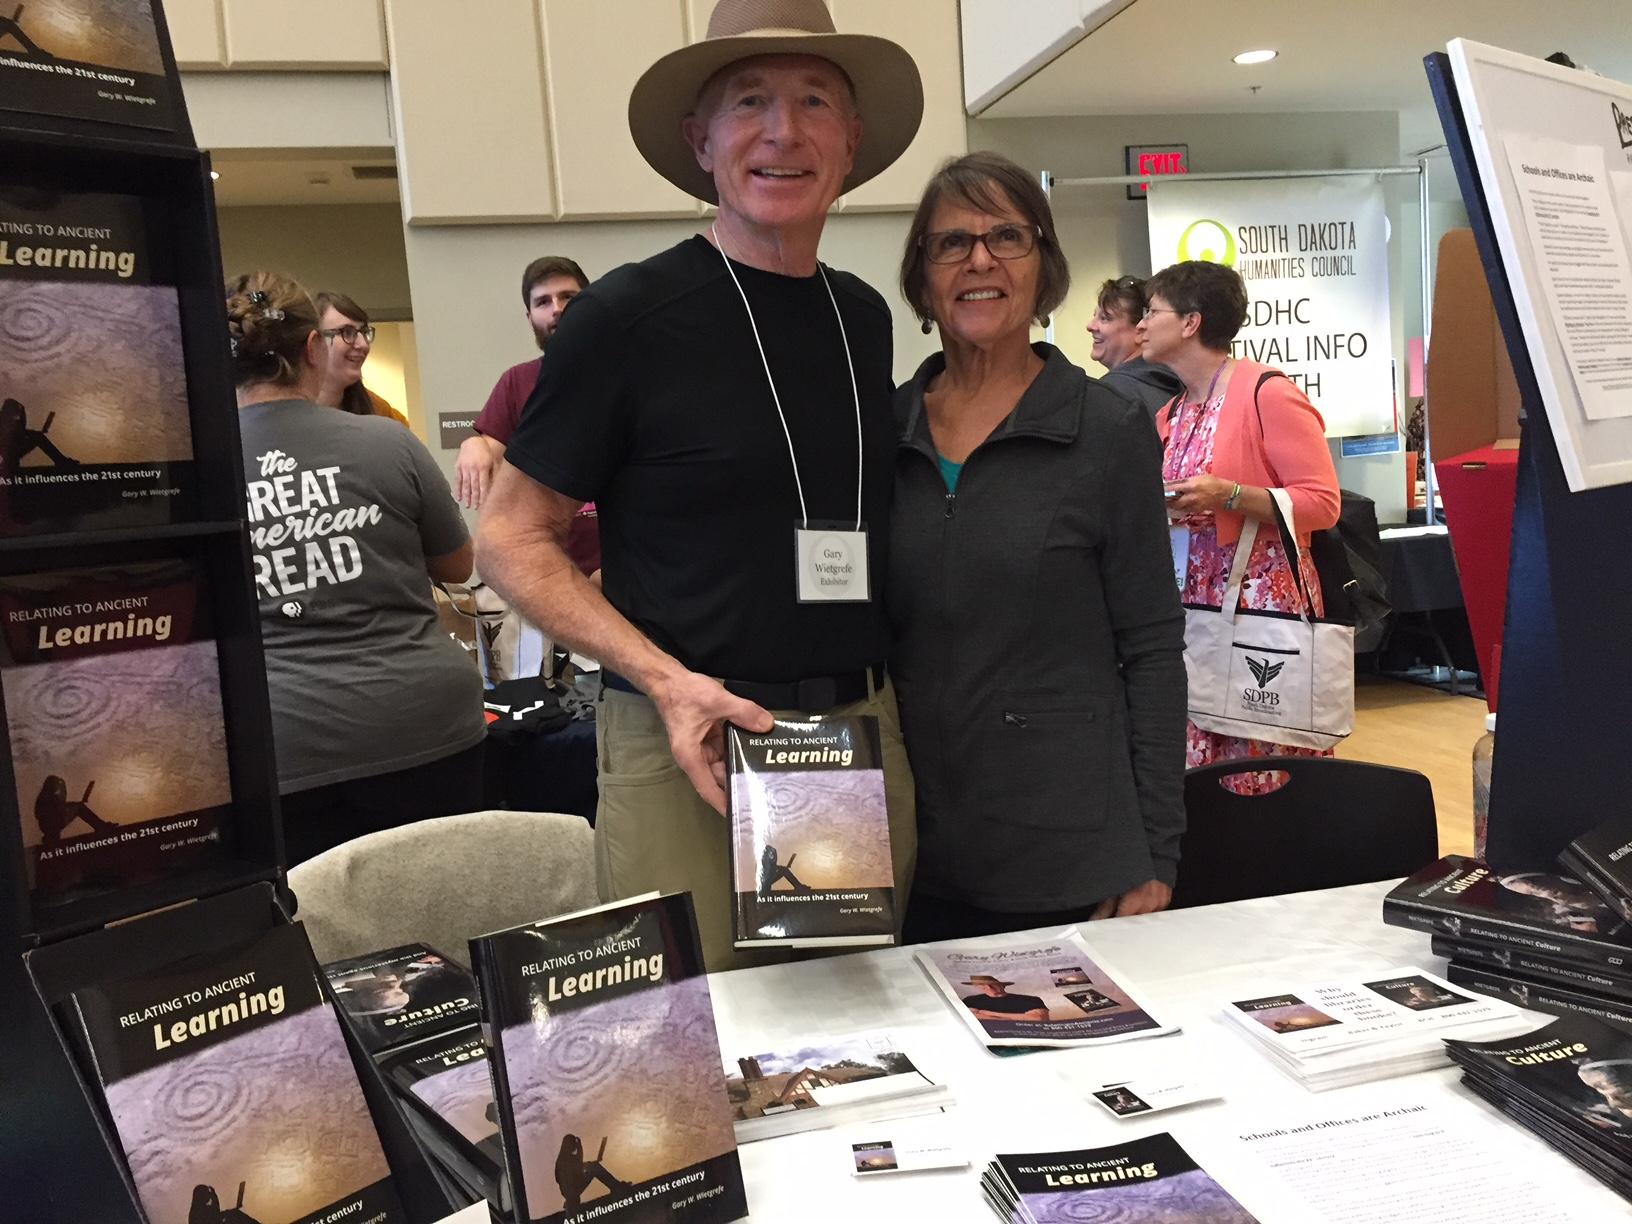 SD Festival of Books Brookings SD 4 Sep 21-22 2018.JPG